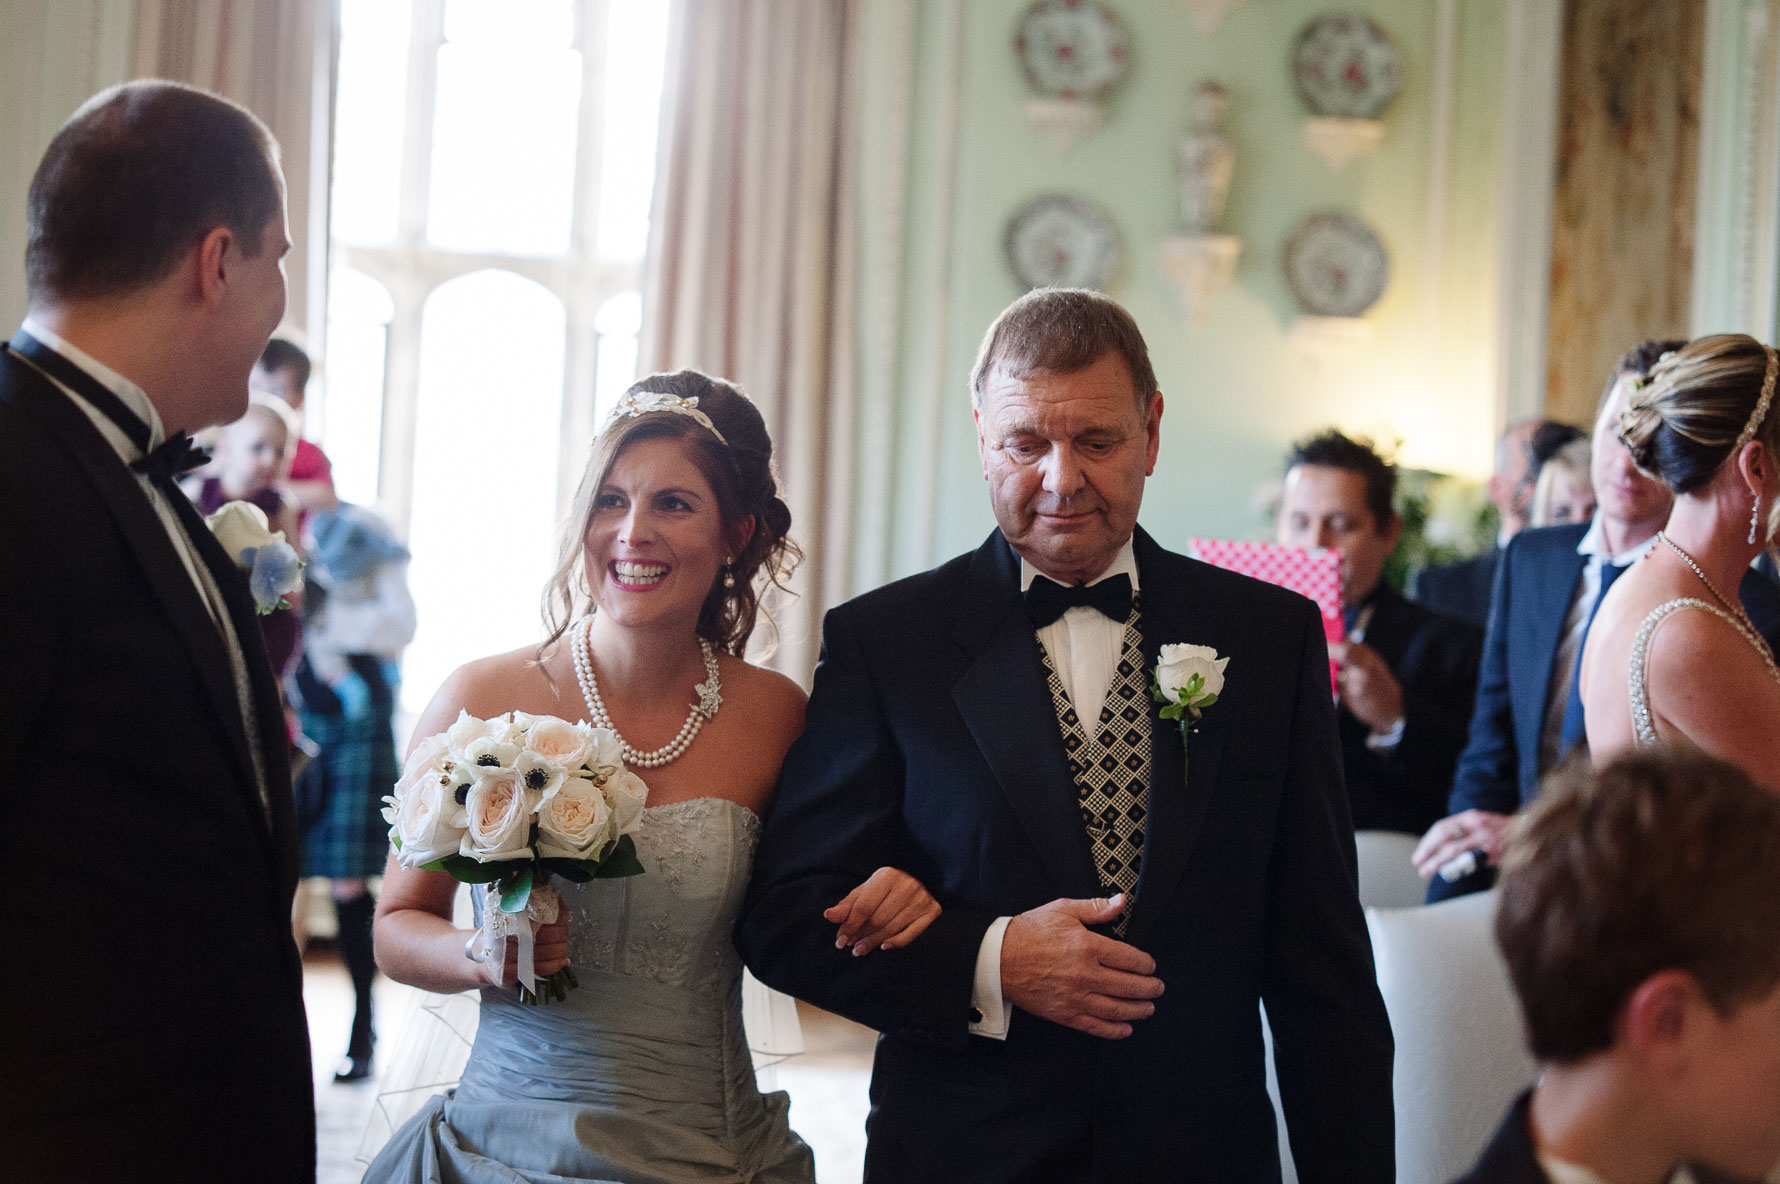 Leeds Castle Wedding14-20140919 0454